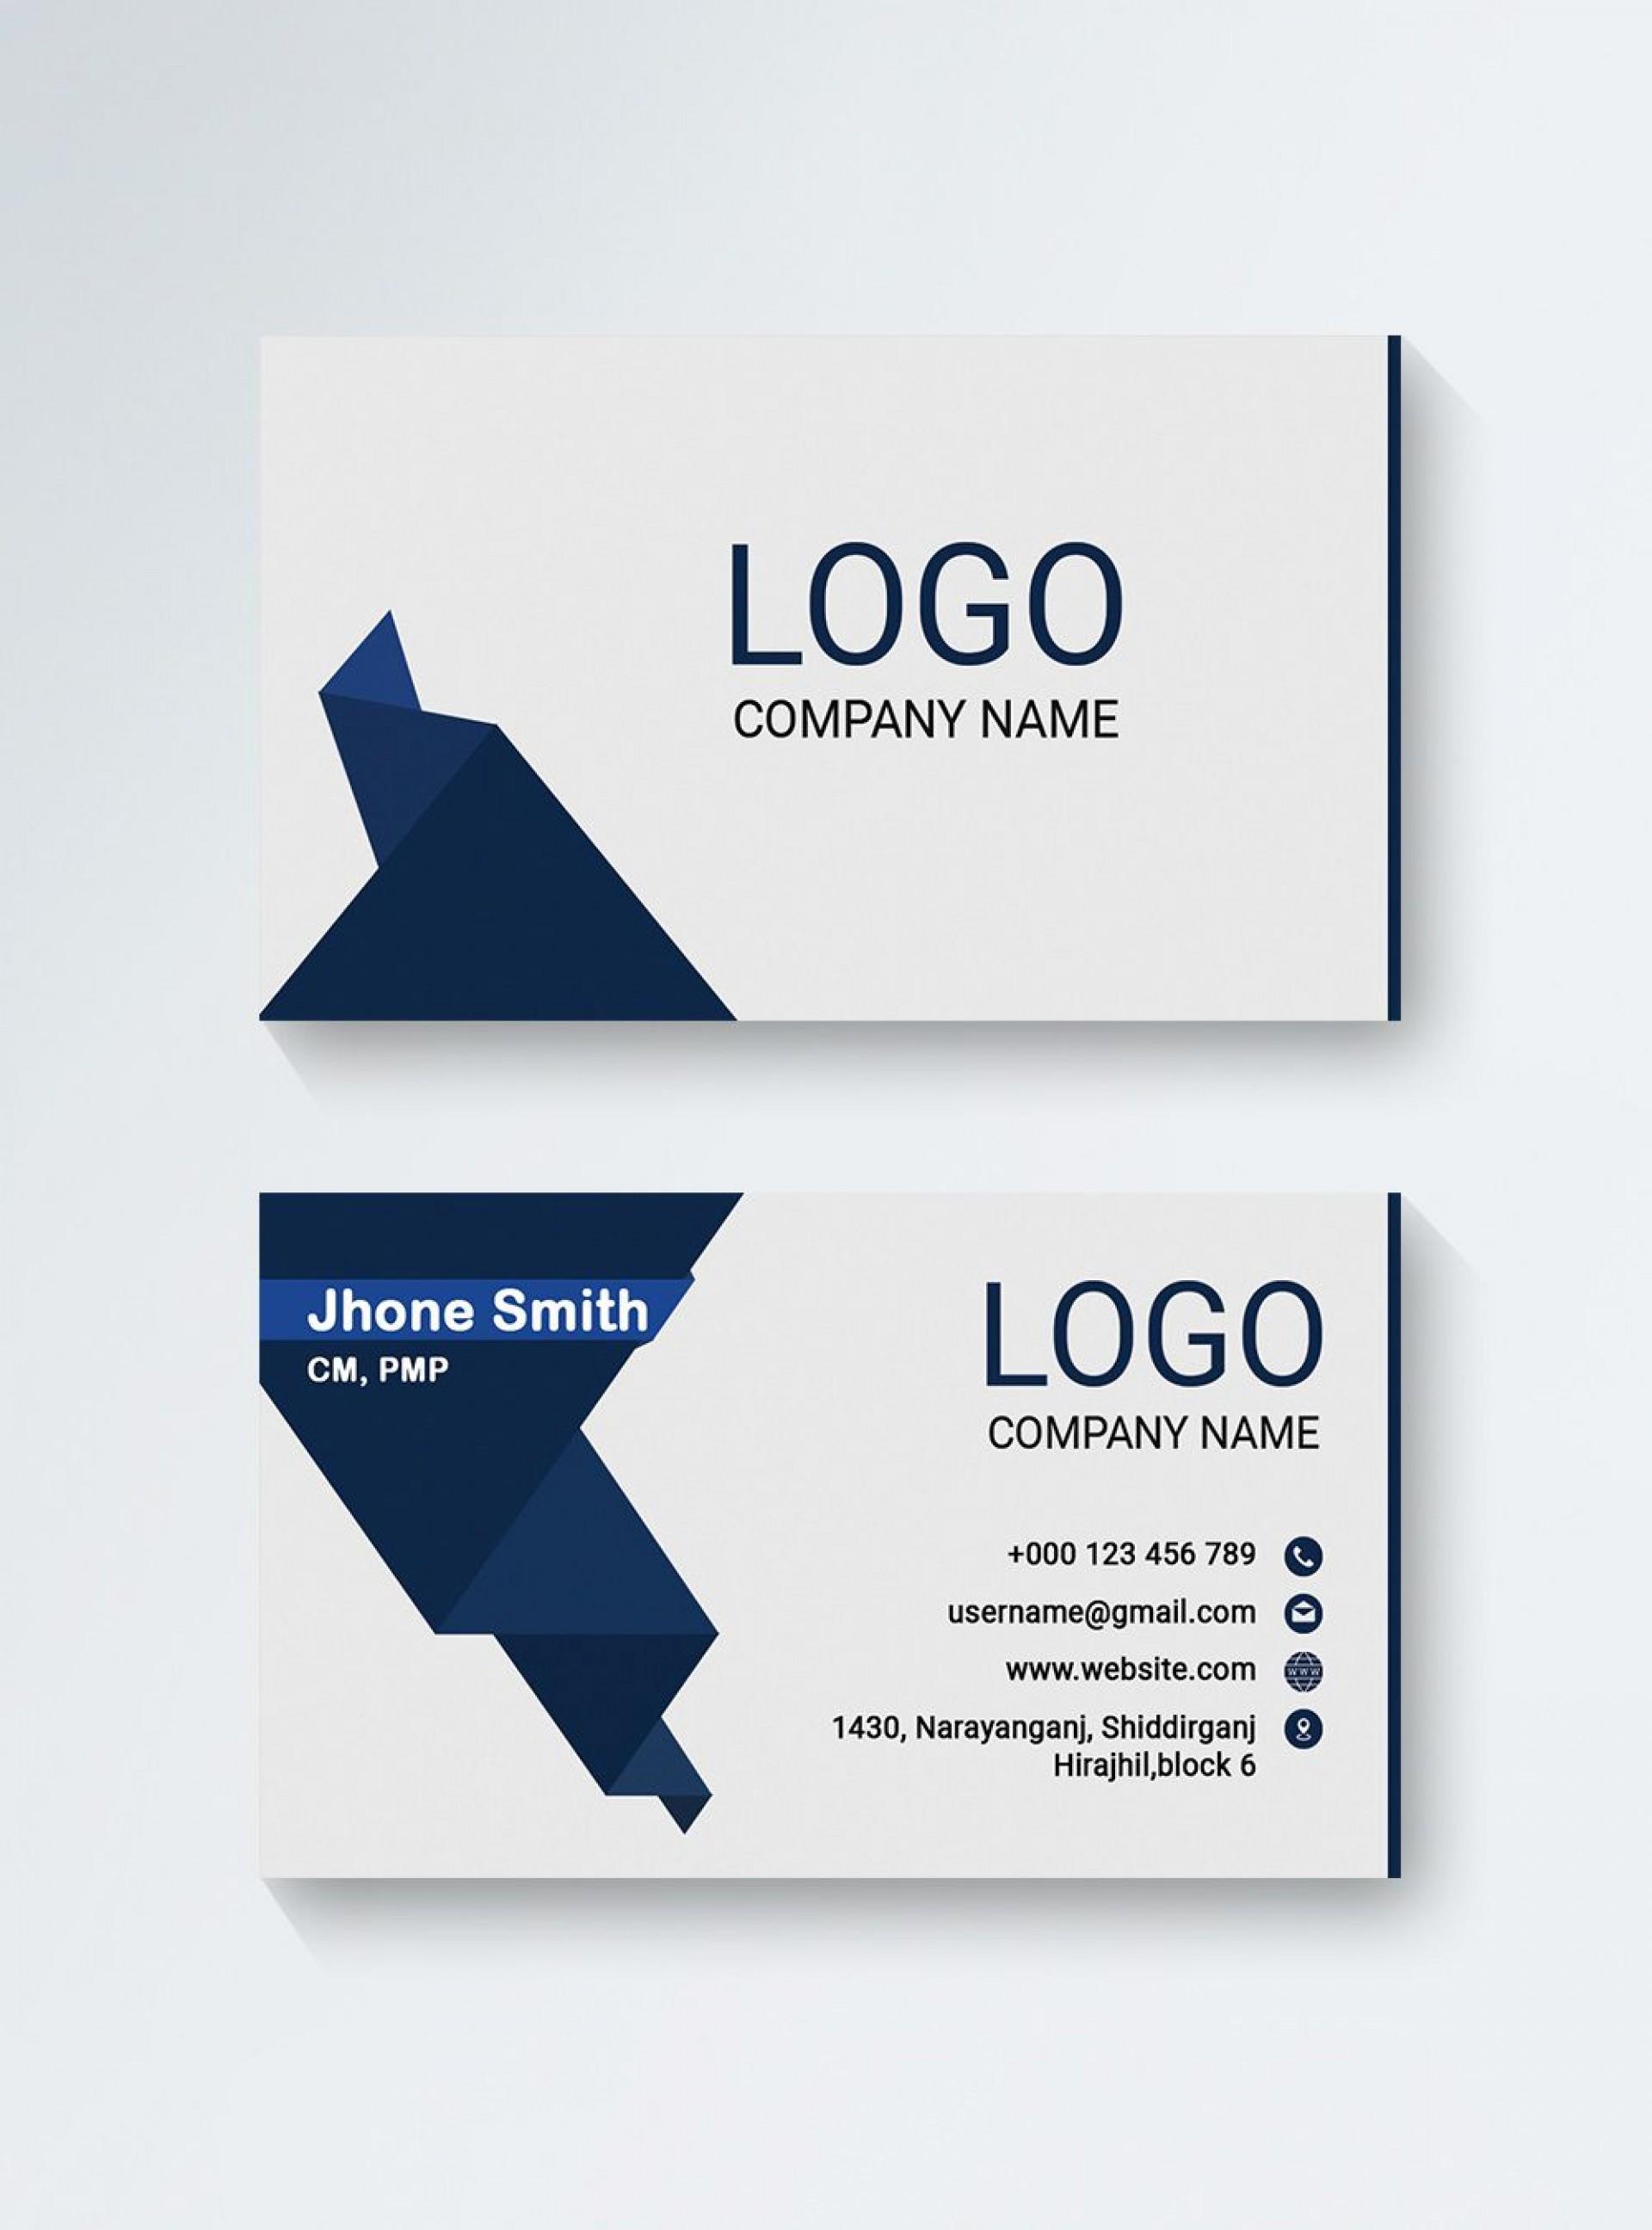 003 Wondrou Minimal Busines Card Template Free Download Sample  Simple Design Coreldraw1920